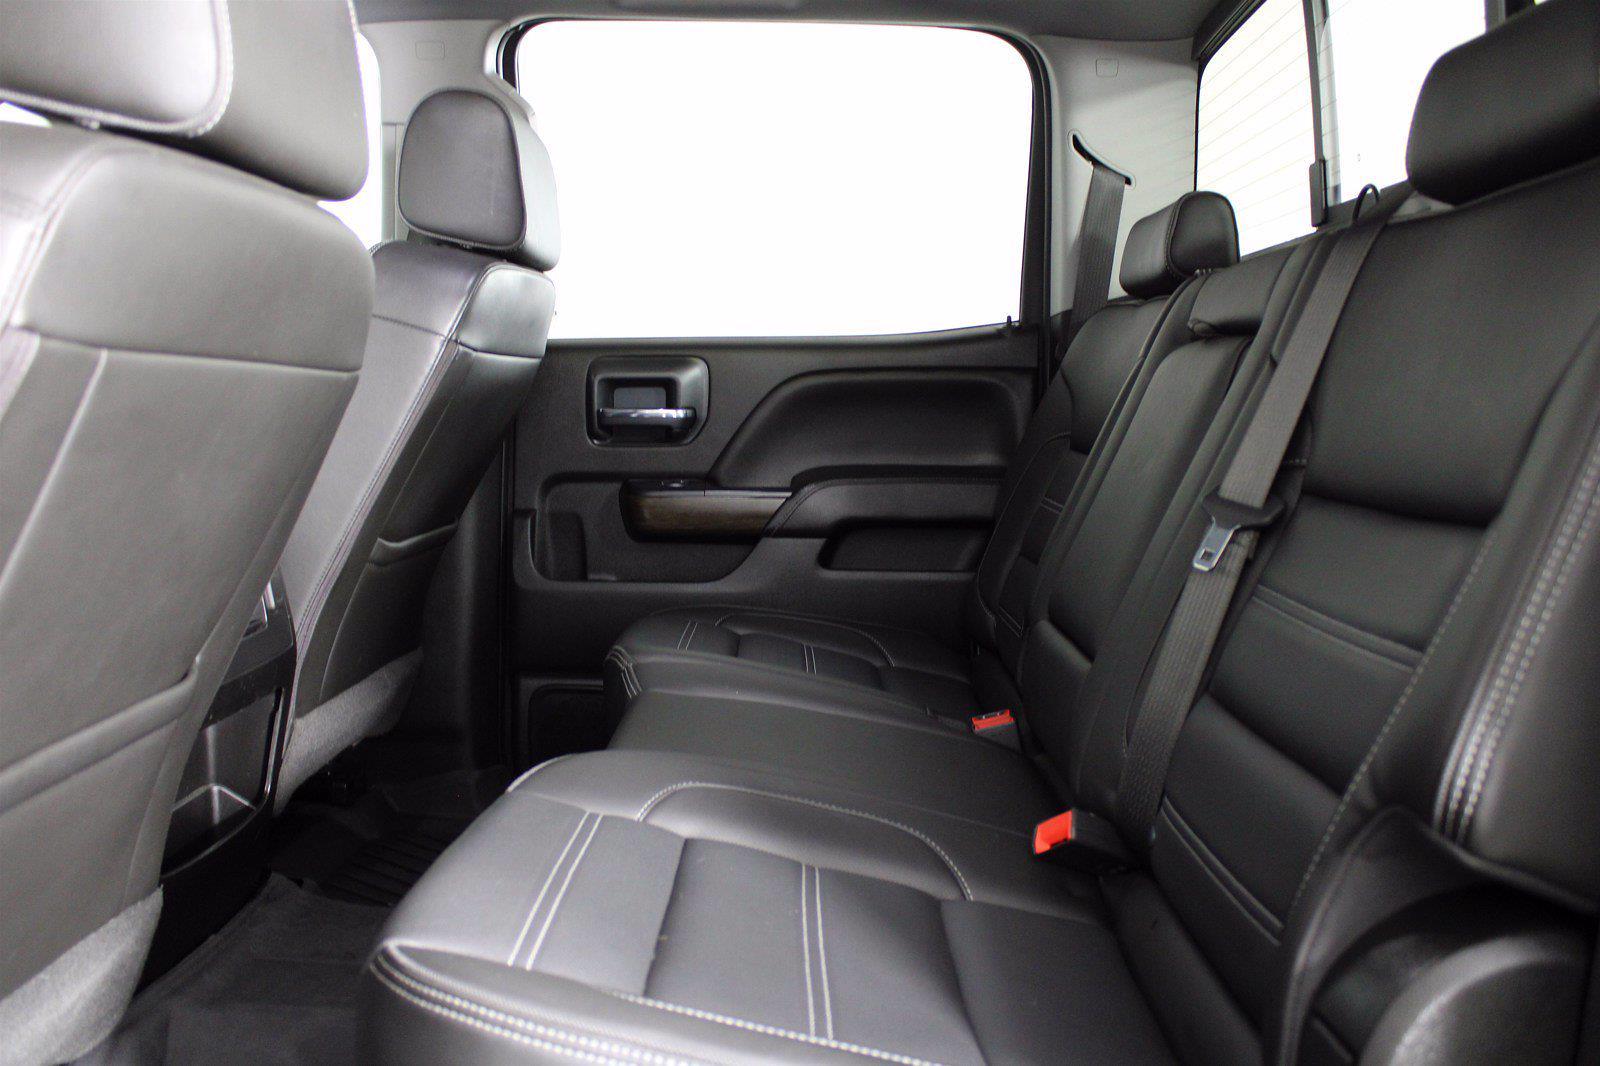 2018 GMC Sierra 2500 Crew Cab 4x4, Pickup #DTC1708 - photo 9